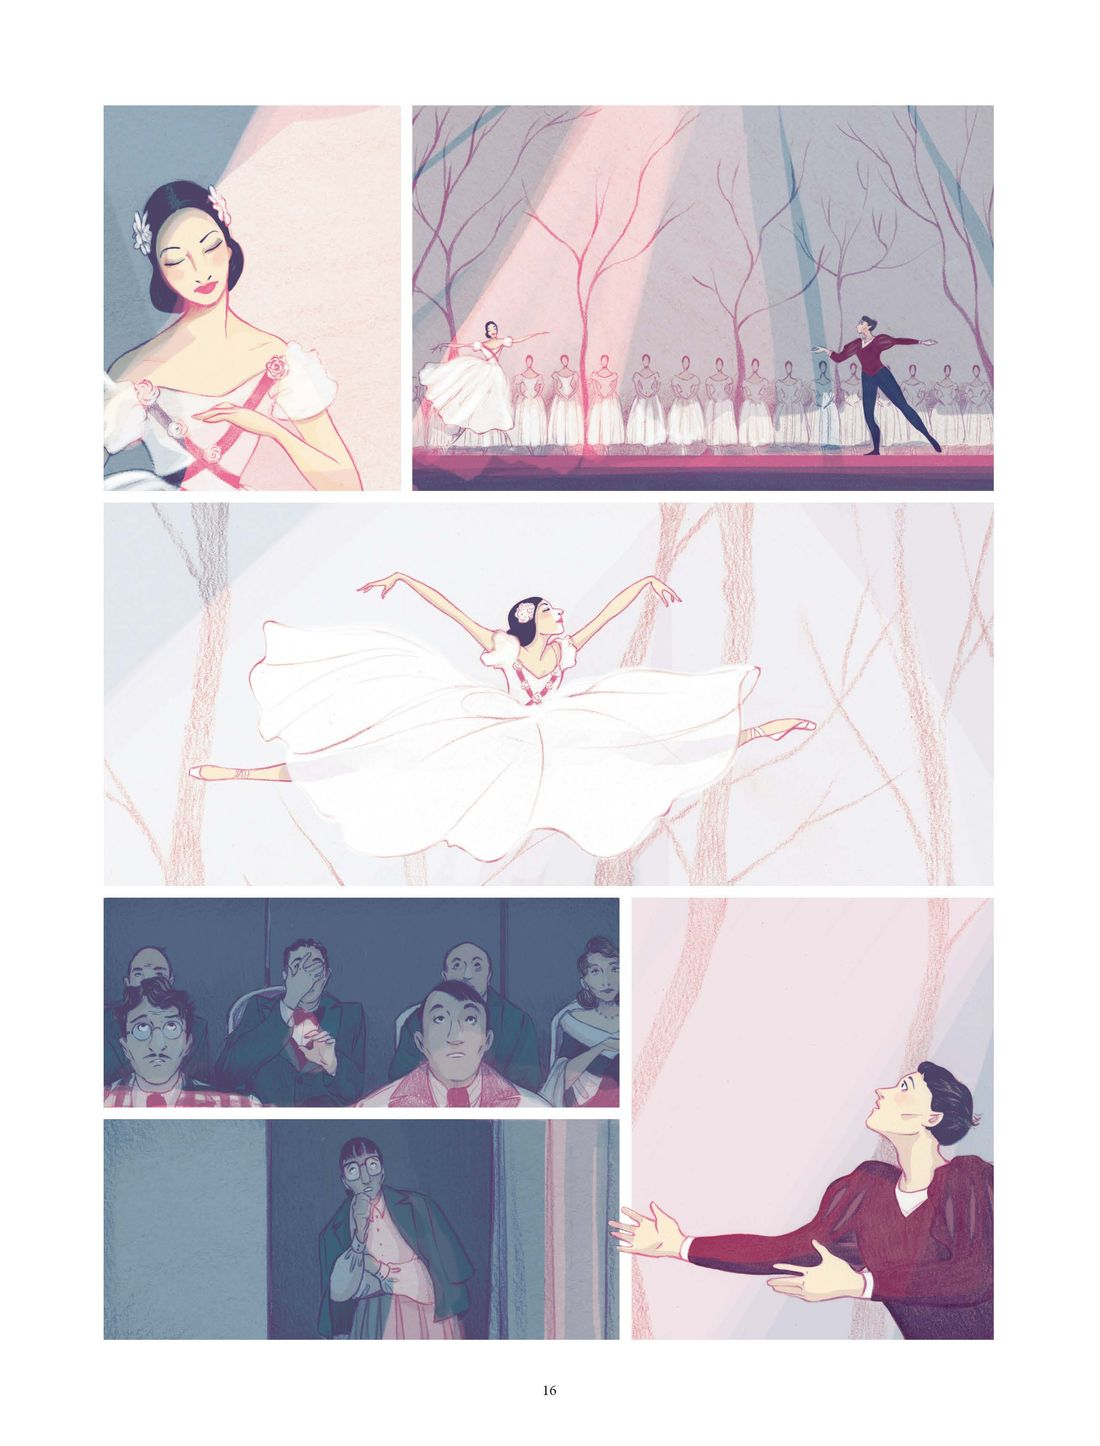 Alicia - Prima ballerina assoluta, planche de l'album © Rue de Sèvres / Goust / Hofer